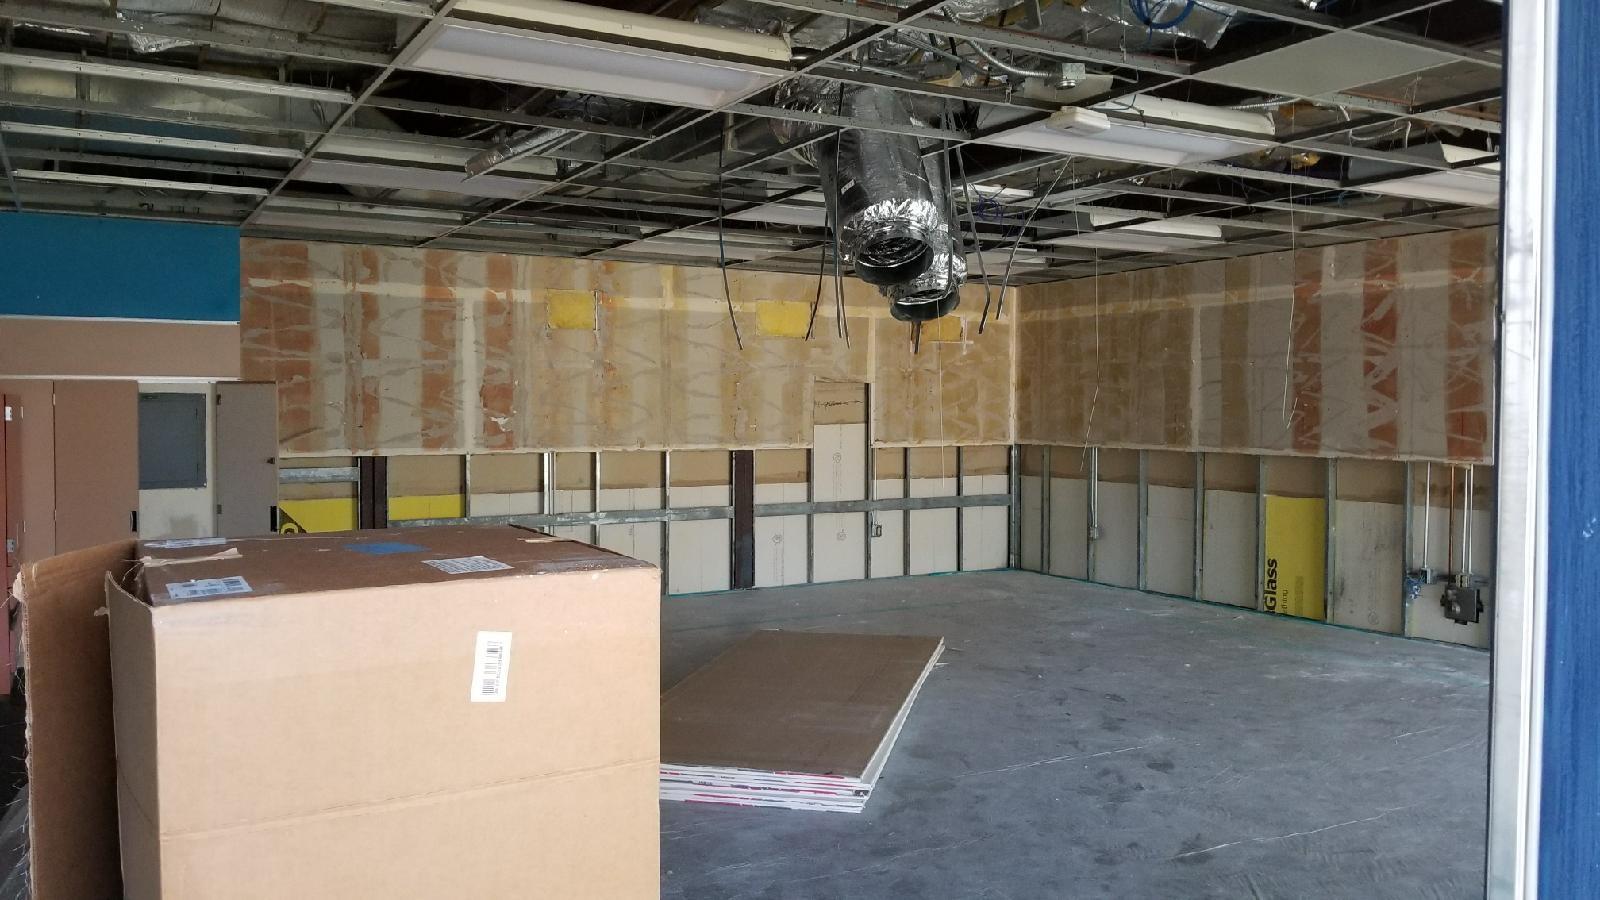 Park Hill Elementary School Modernization Construction